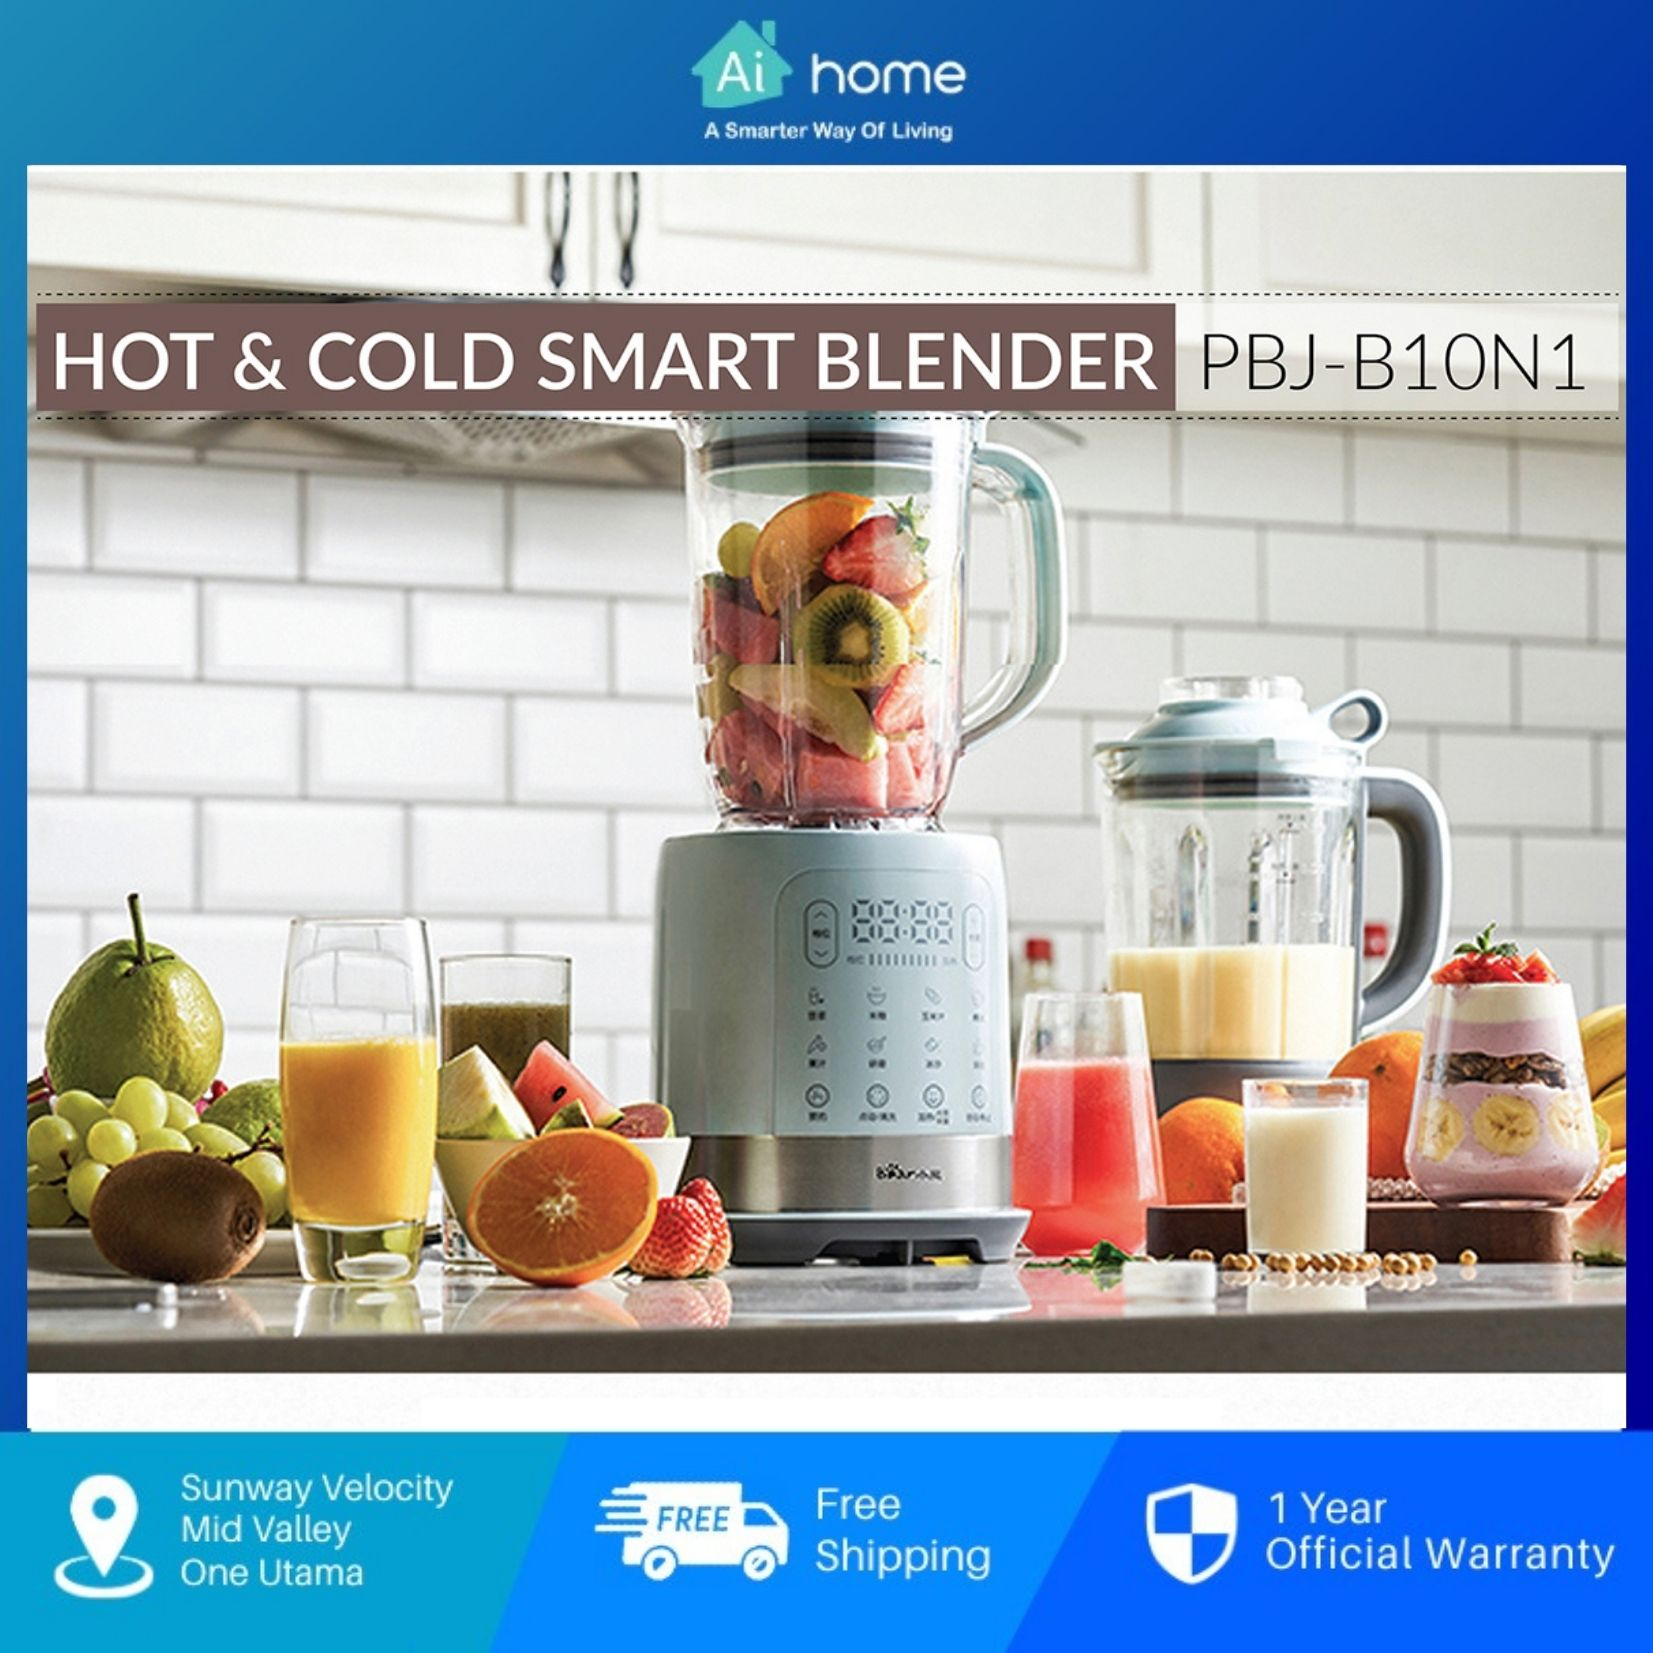 Bear Multifunctional High-Speed Cooking Blender PBJ-B10N1 - Smart Crushing and Cooking   Stainless Steel Blade [Aihome]